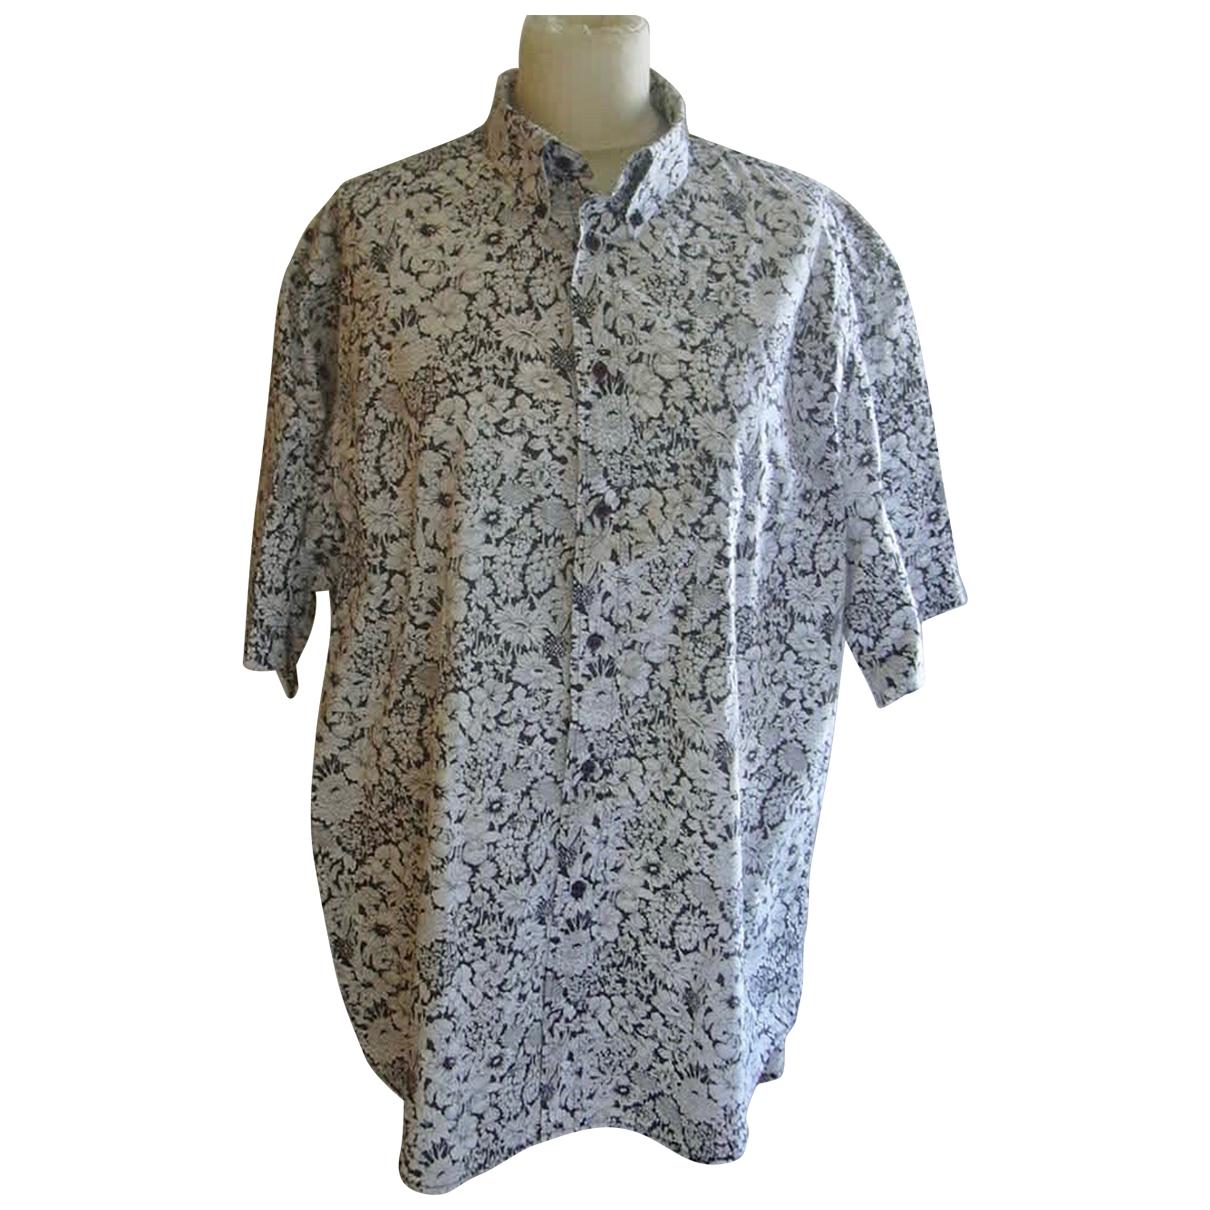 La Chemiserie Cacharel \N Hemden in  Anthrazit Baumwolle